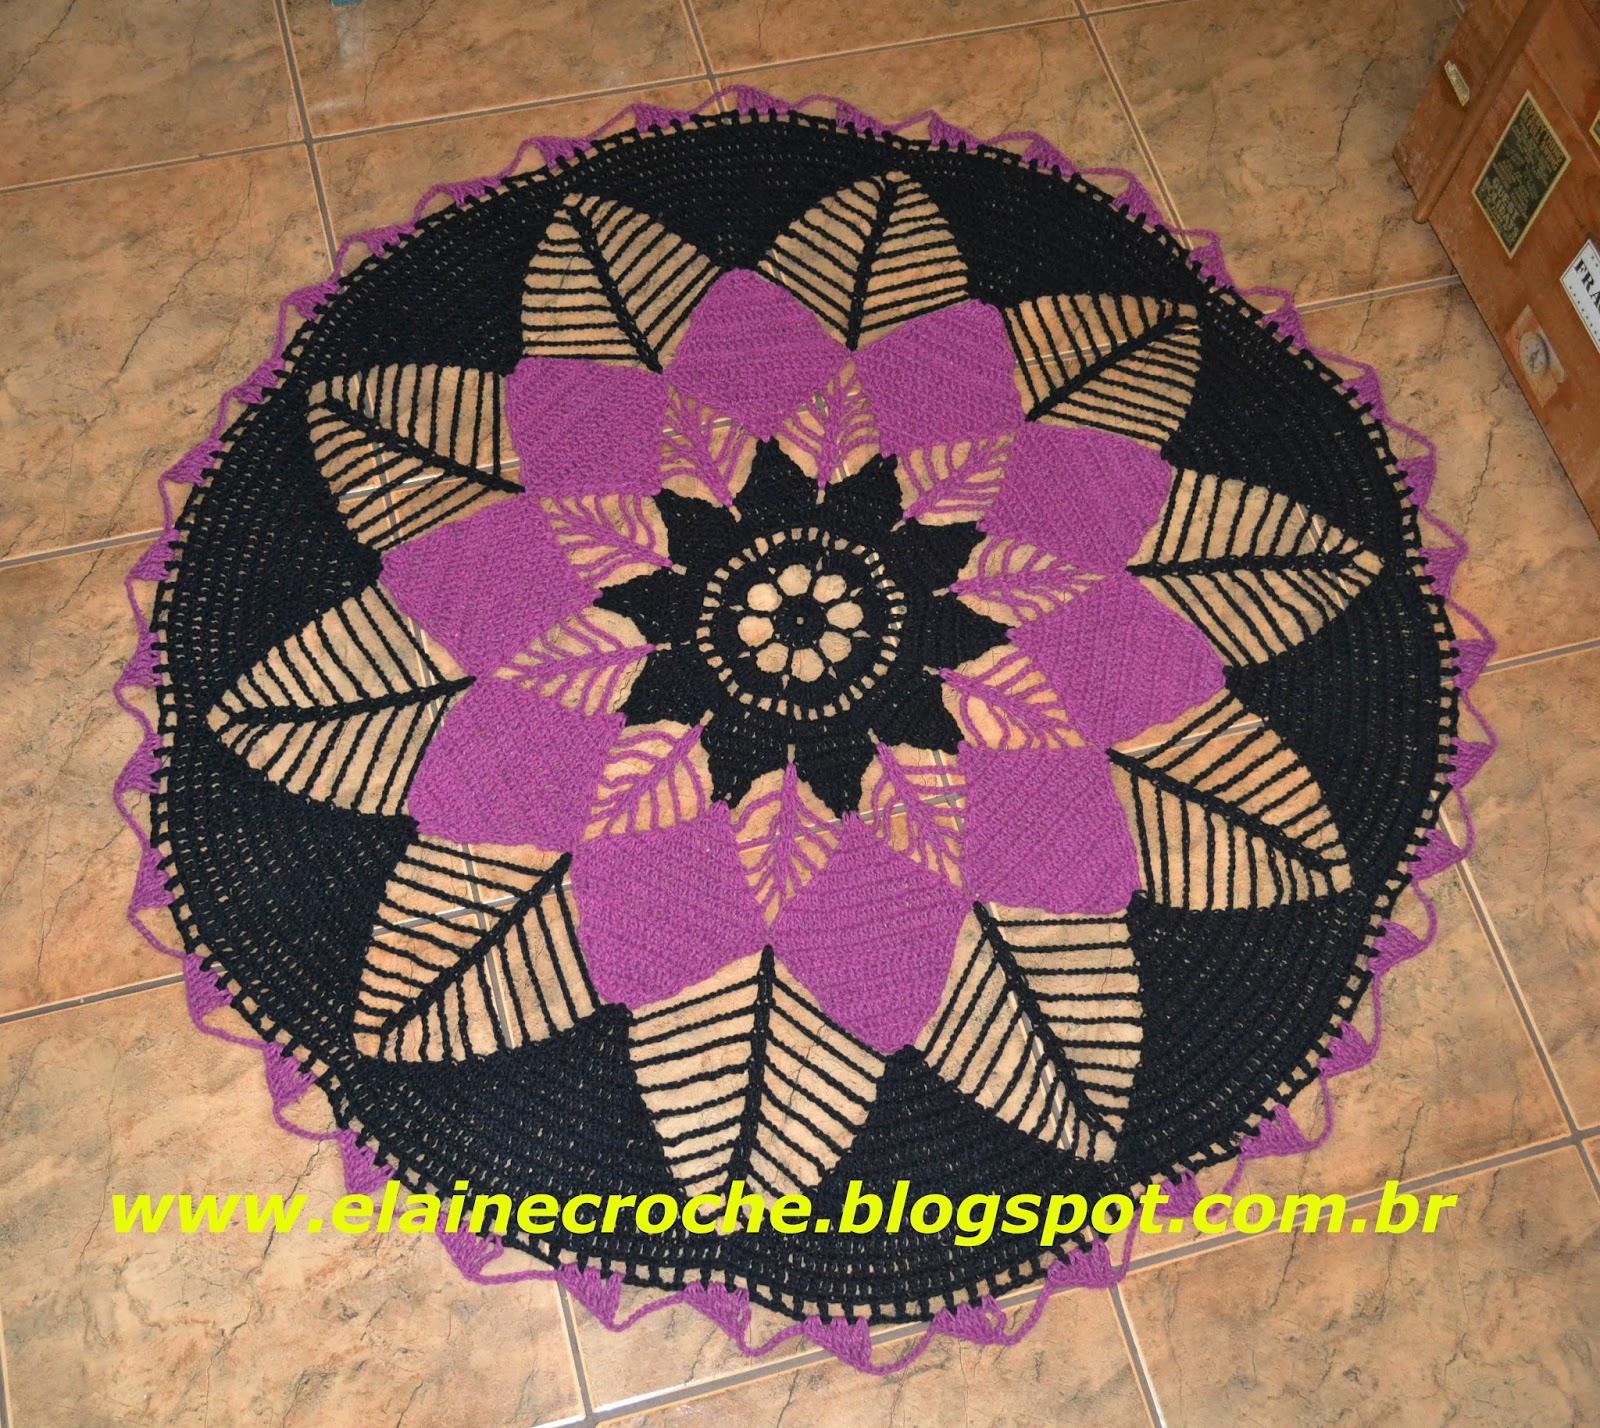 Elaine Croche Tapete Pet Nia Gigante Em Croch V Deo Aula Croch  -> Tapete Croche Grande